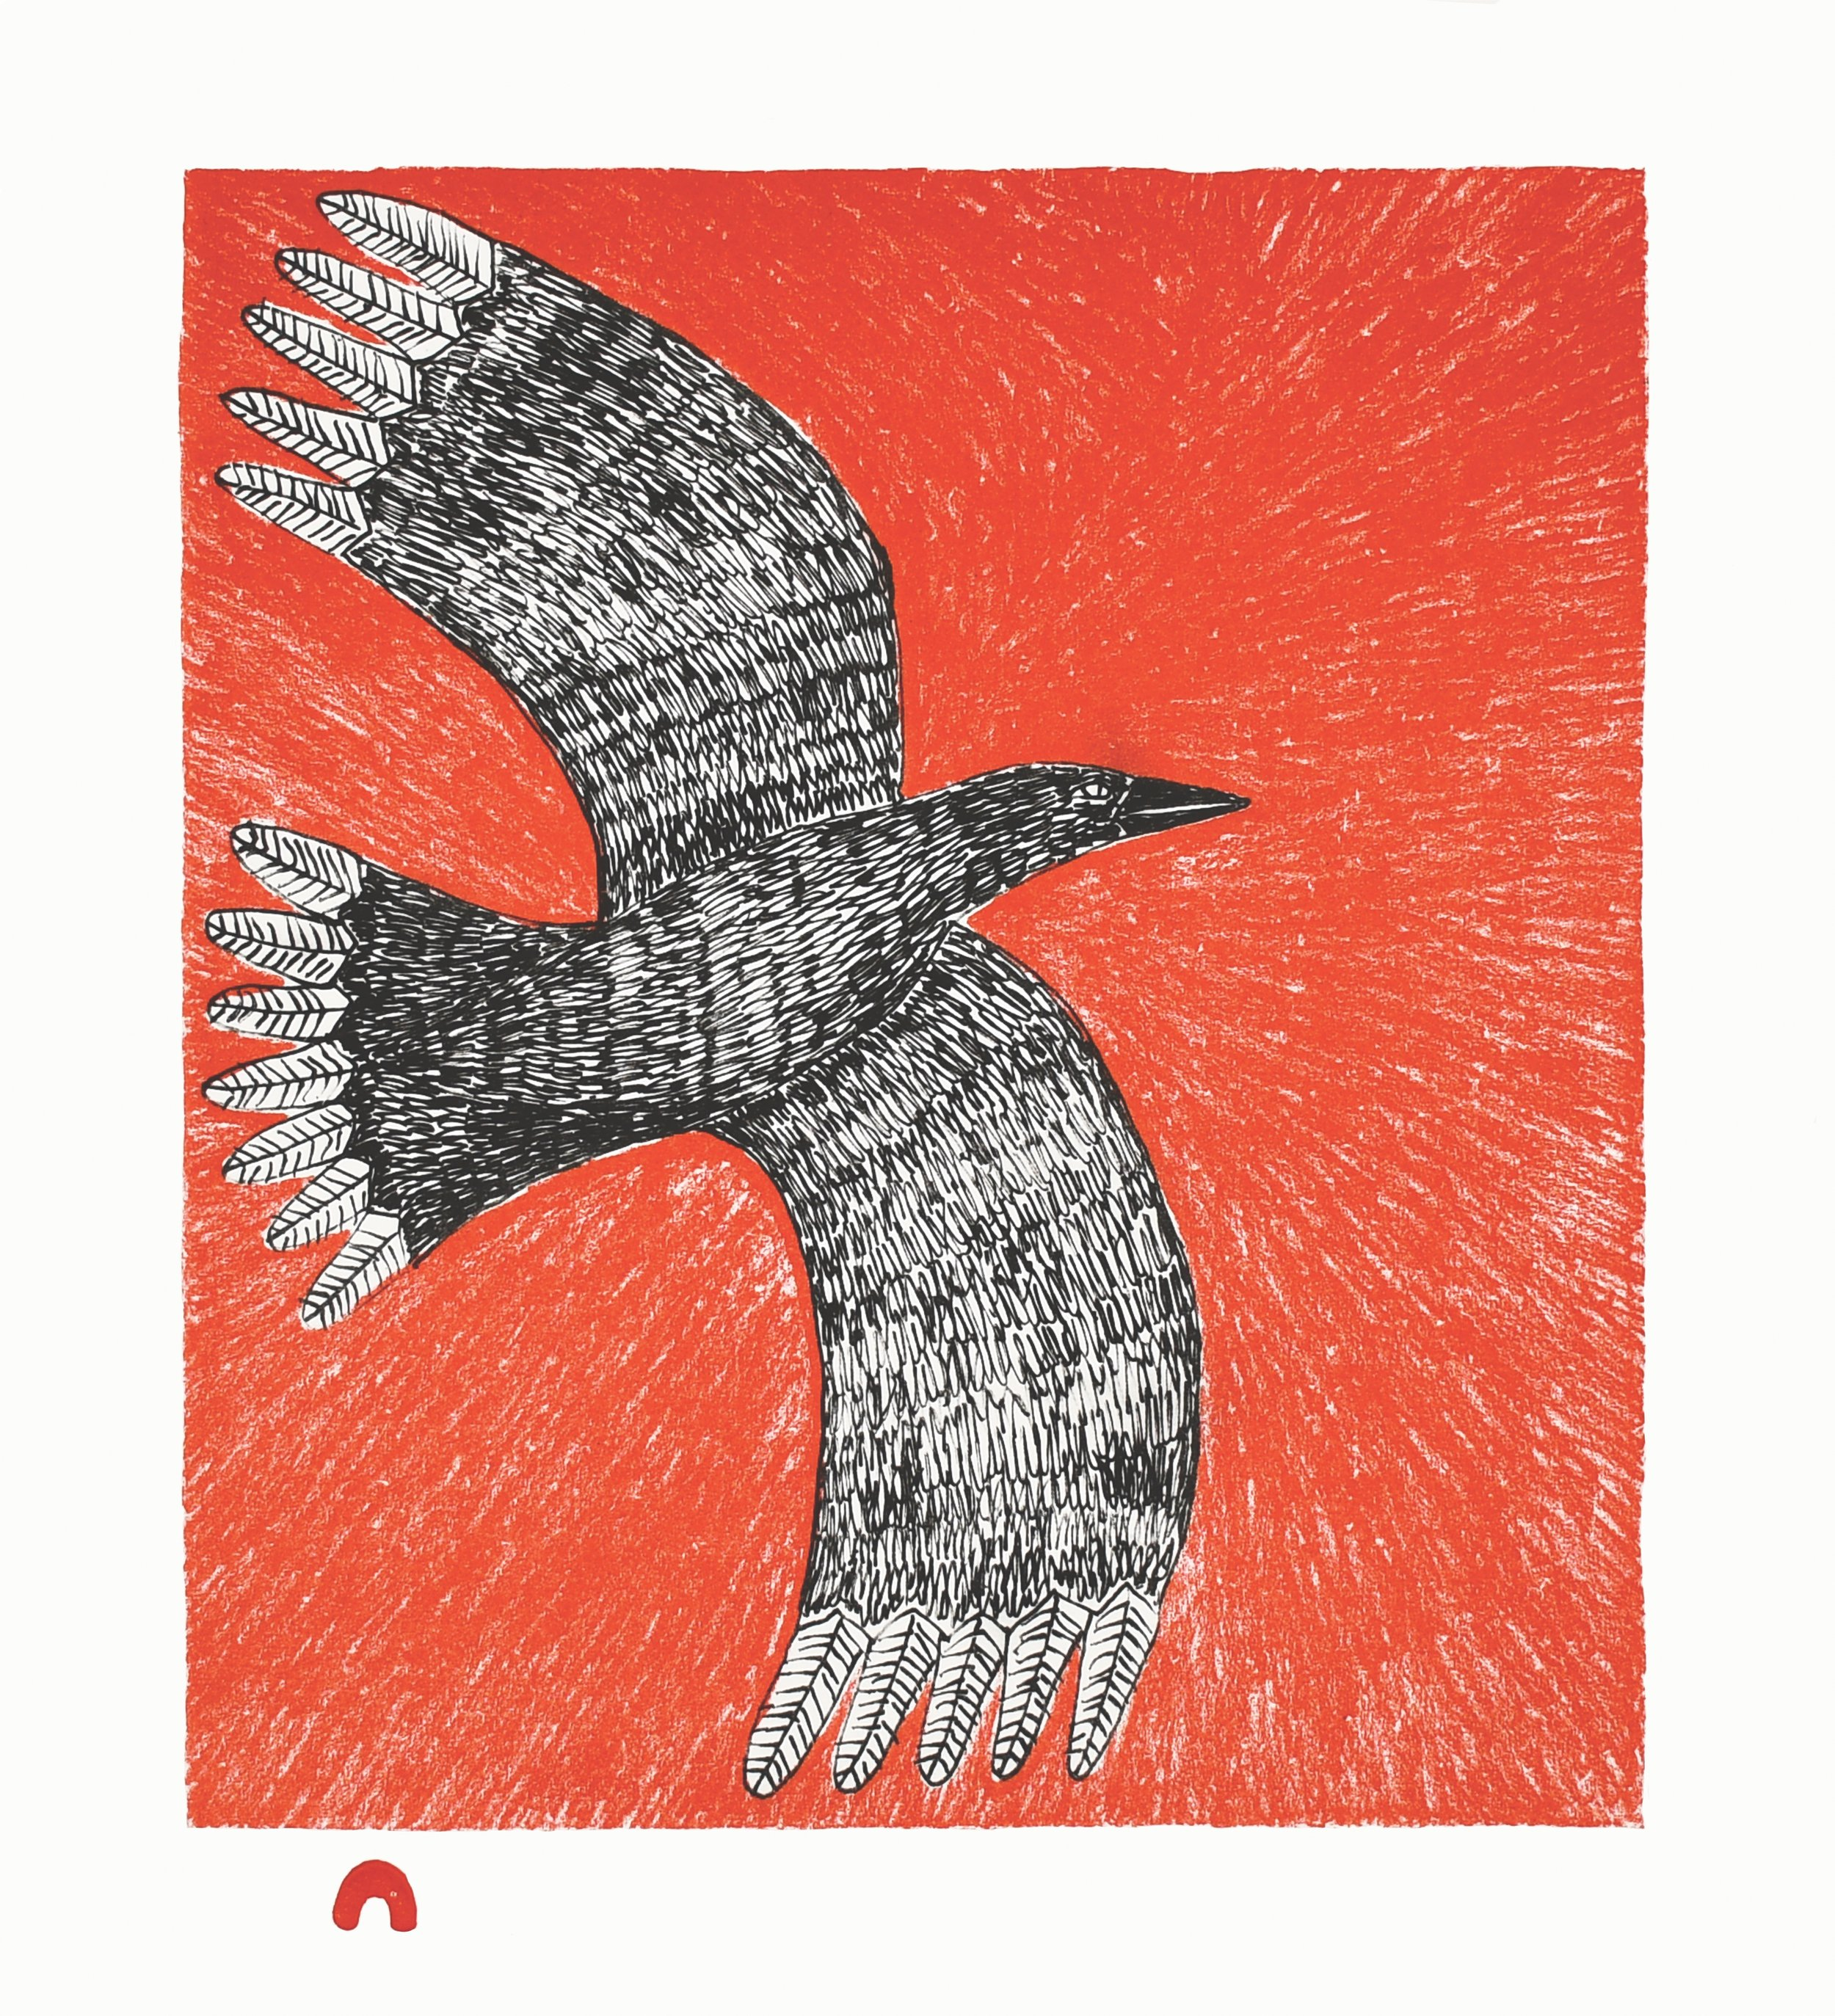 NINGIUKULU TEEVEE  7. Flight  Lithograph  Paper: BFK White  Printer: Nujalia Quvianaqtuliaq  27.5 x 25.5 cm  $ 500